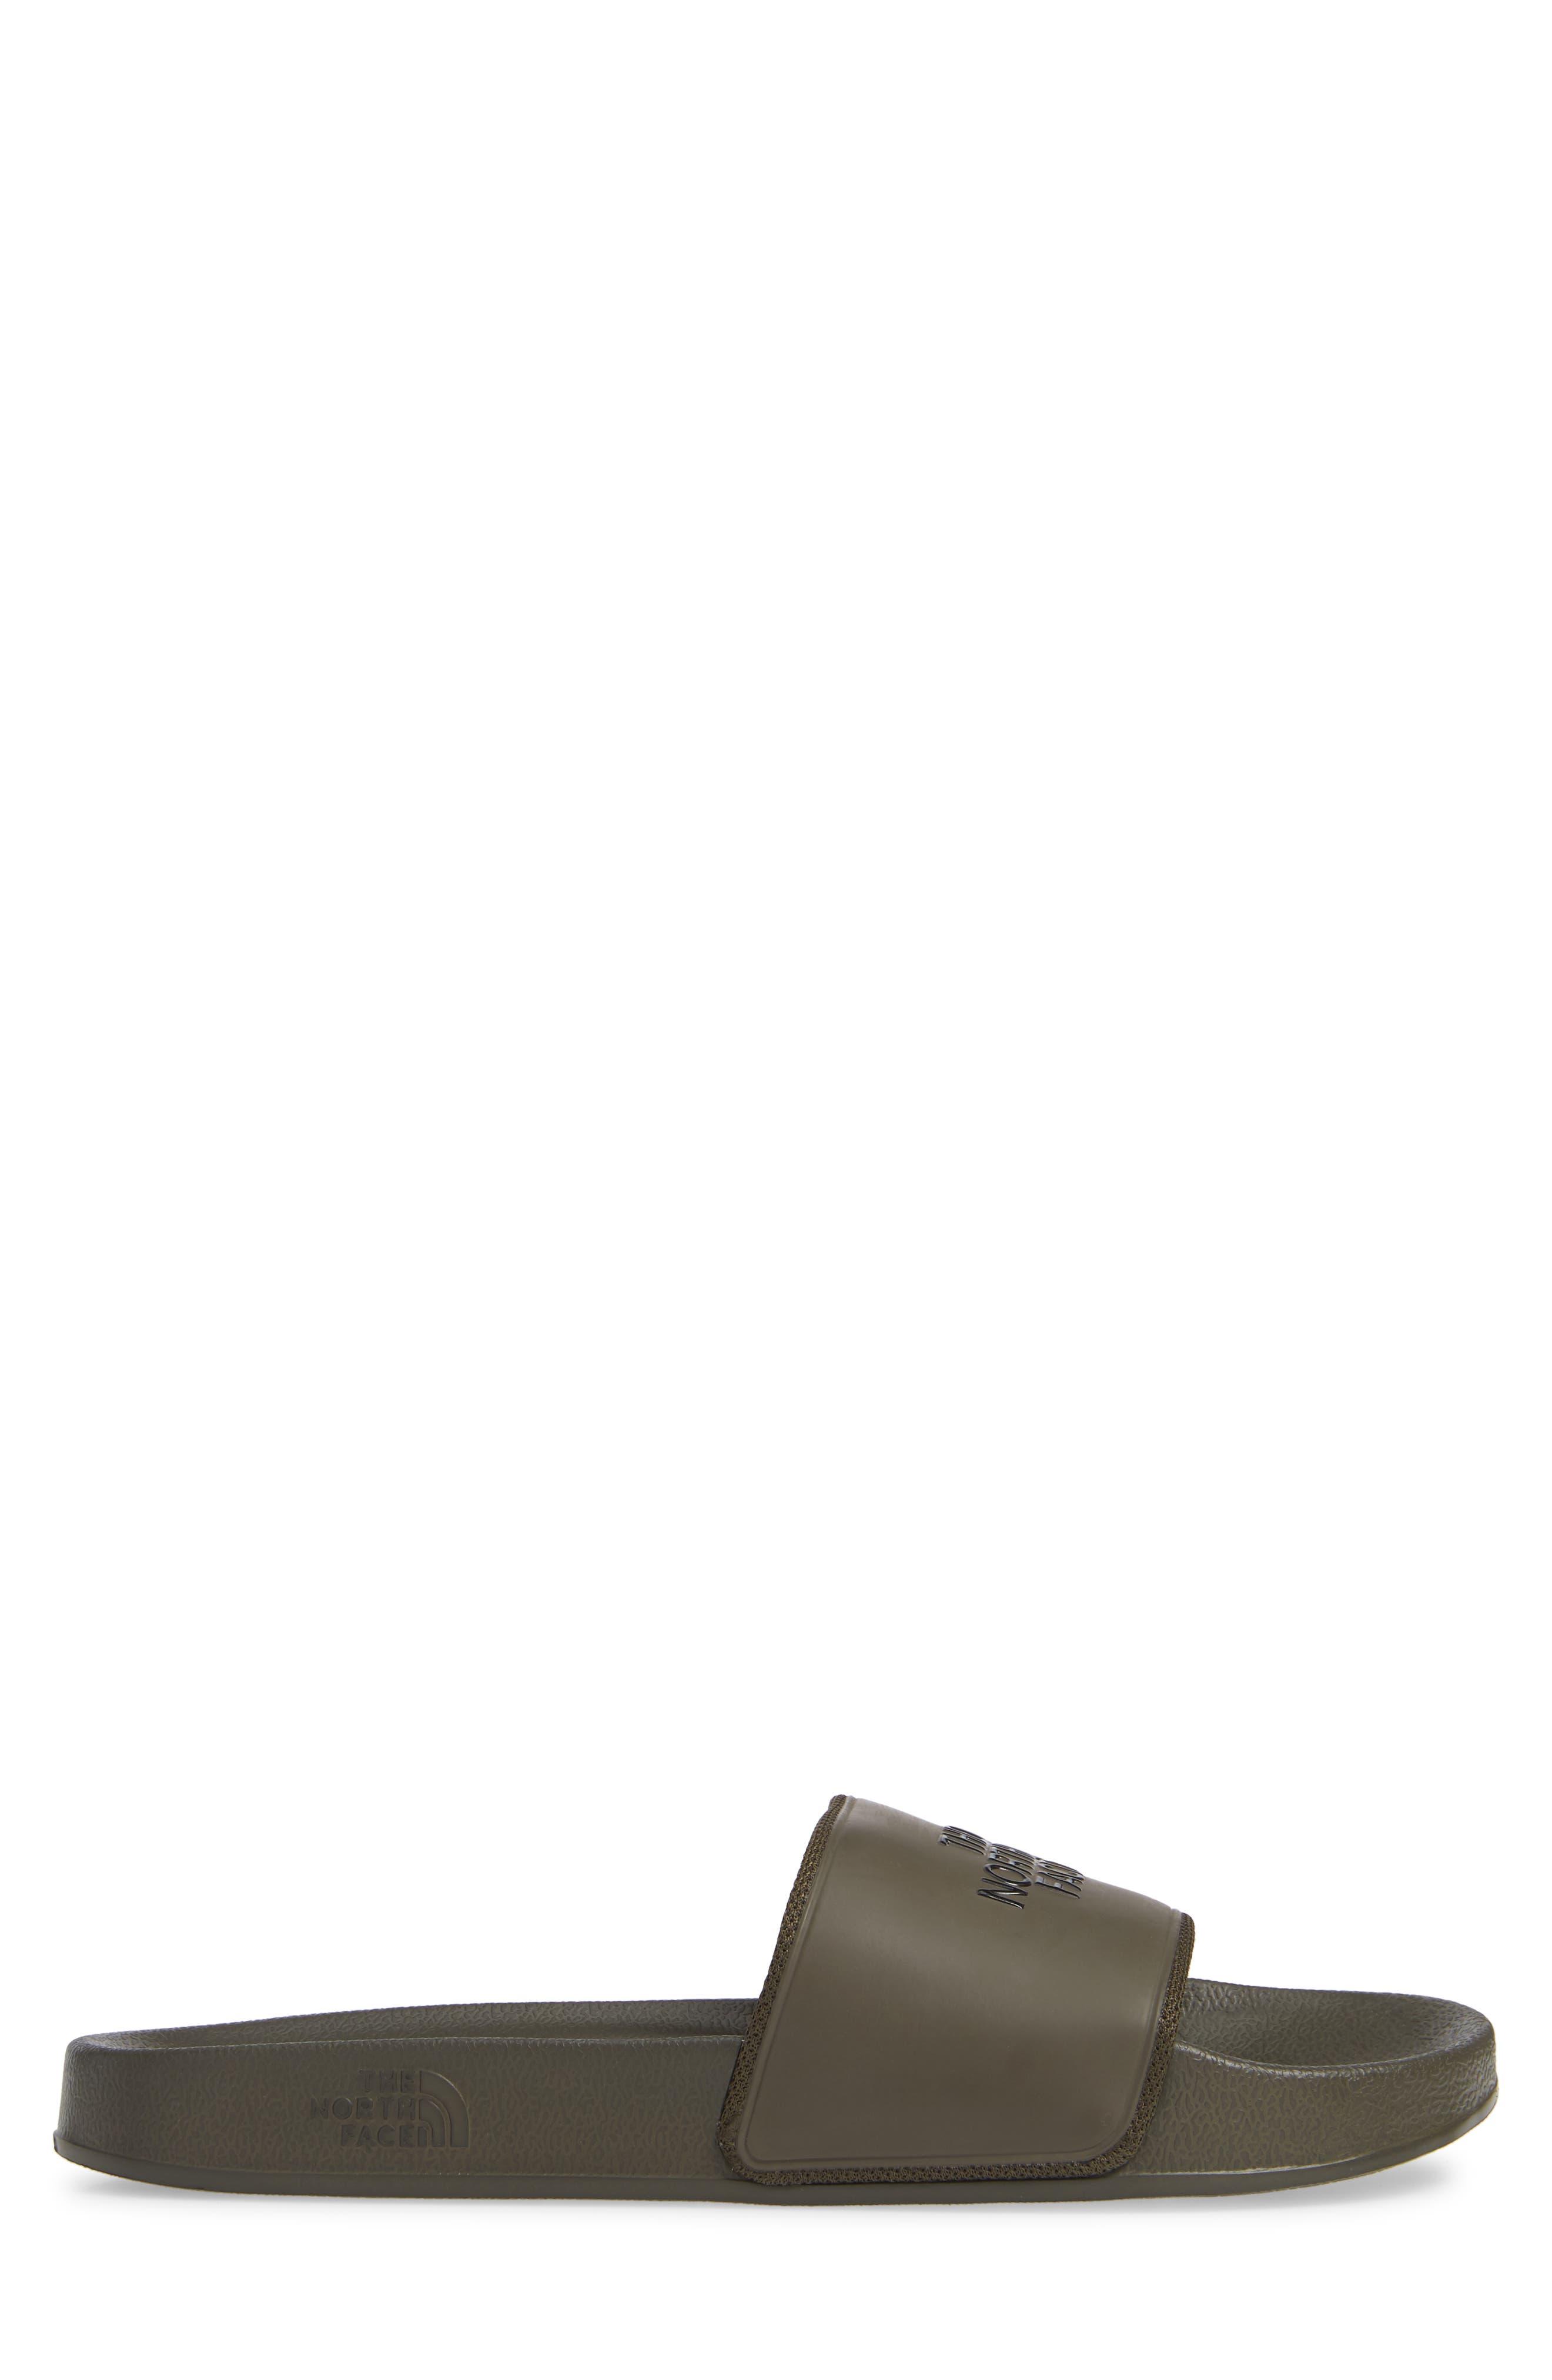 Base Camp II Slide Sandal,                             Alternate thumbnail 3, color,                             TARMAC GREEN/ BLACK